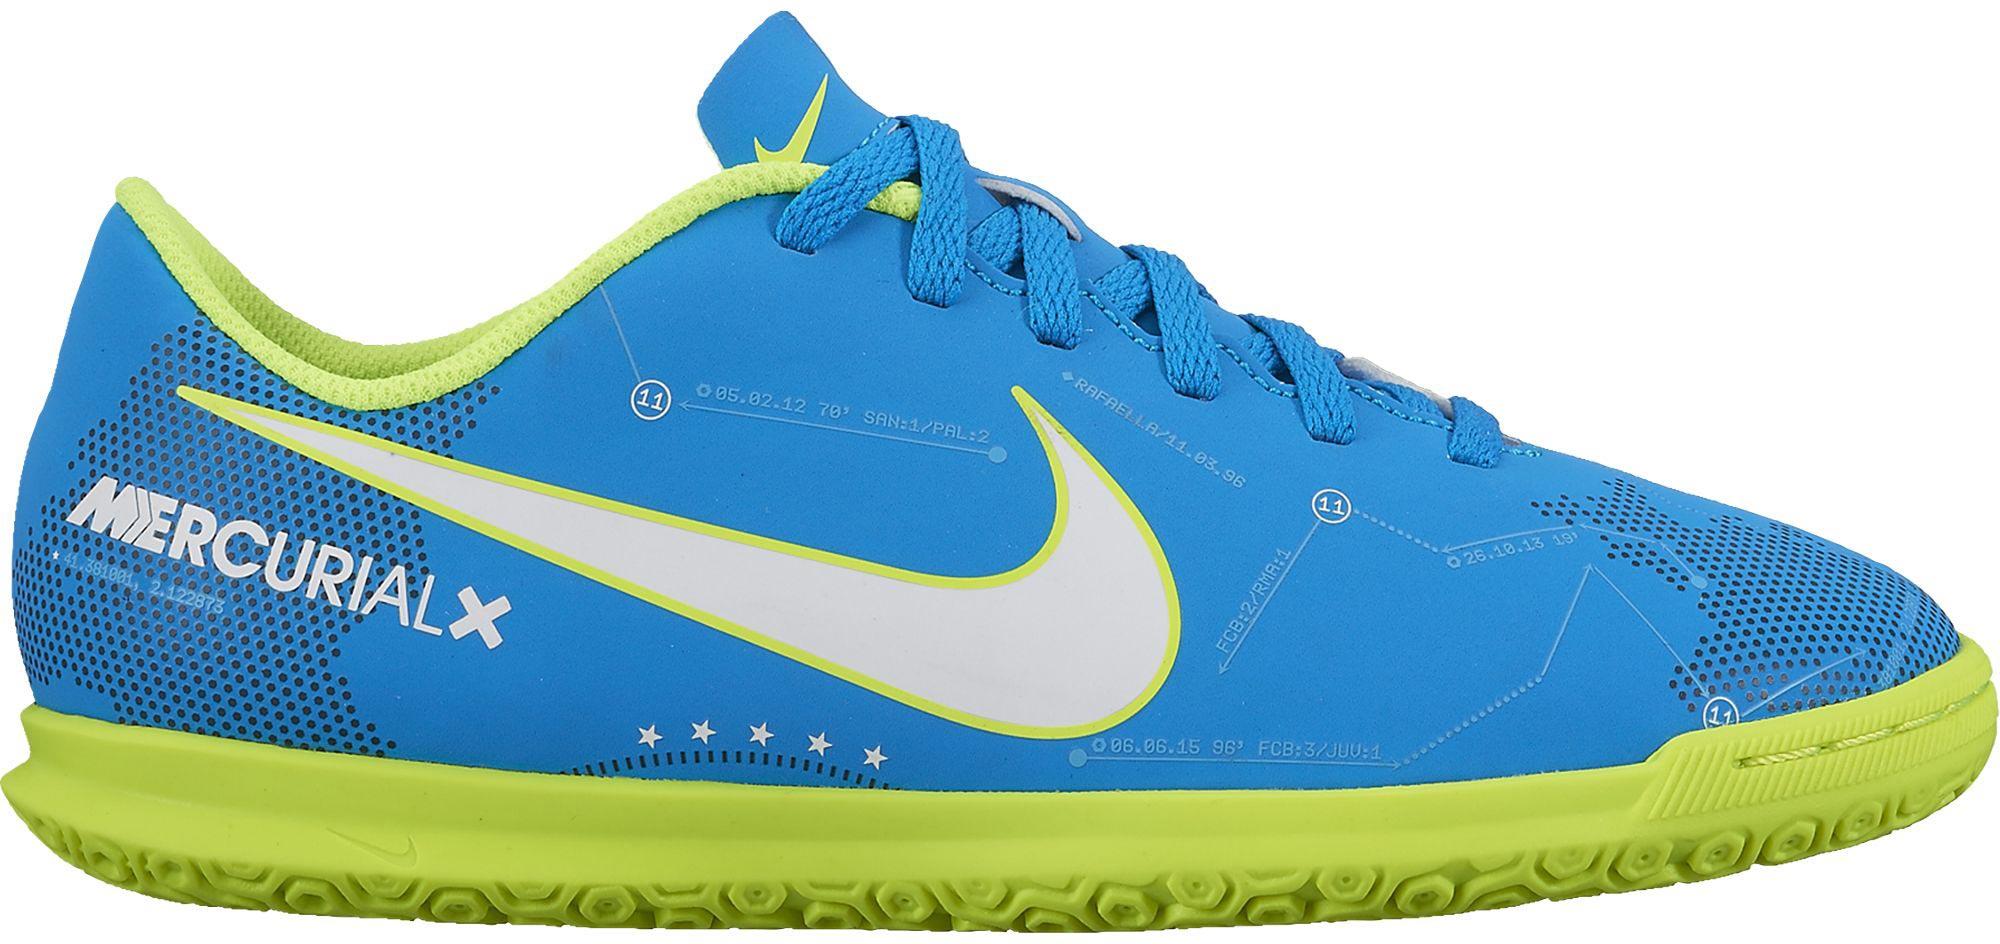 3b53274fcc2 Nike MERCURIALX VORTEX III NJR IC